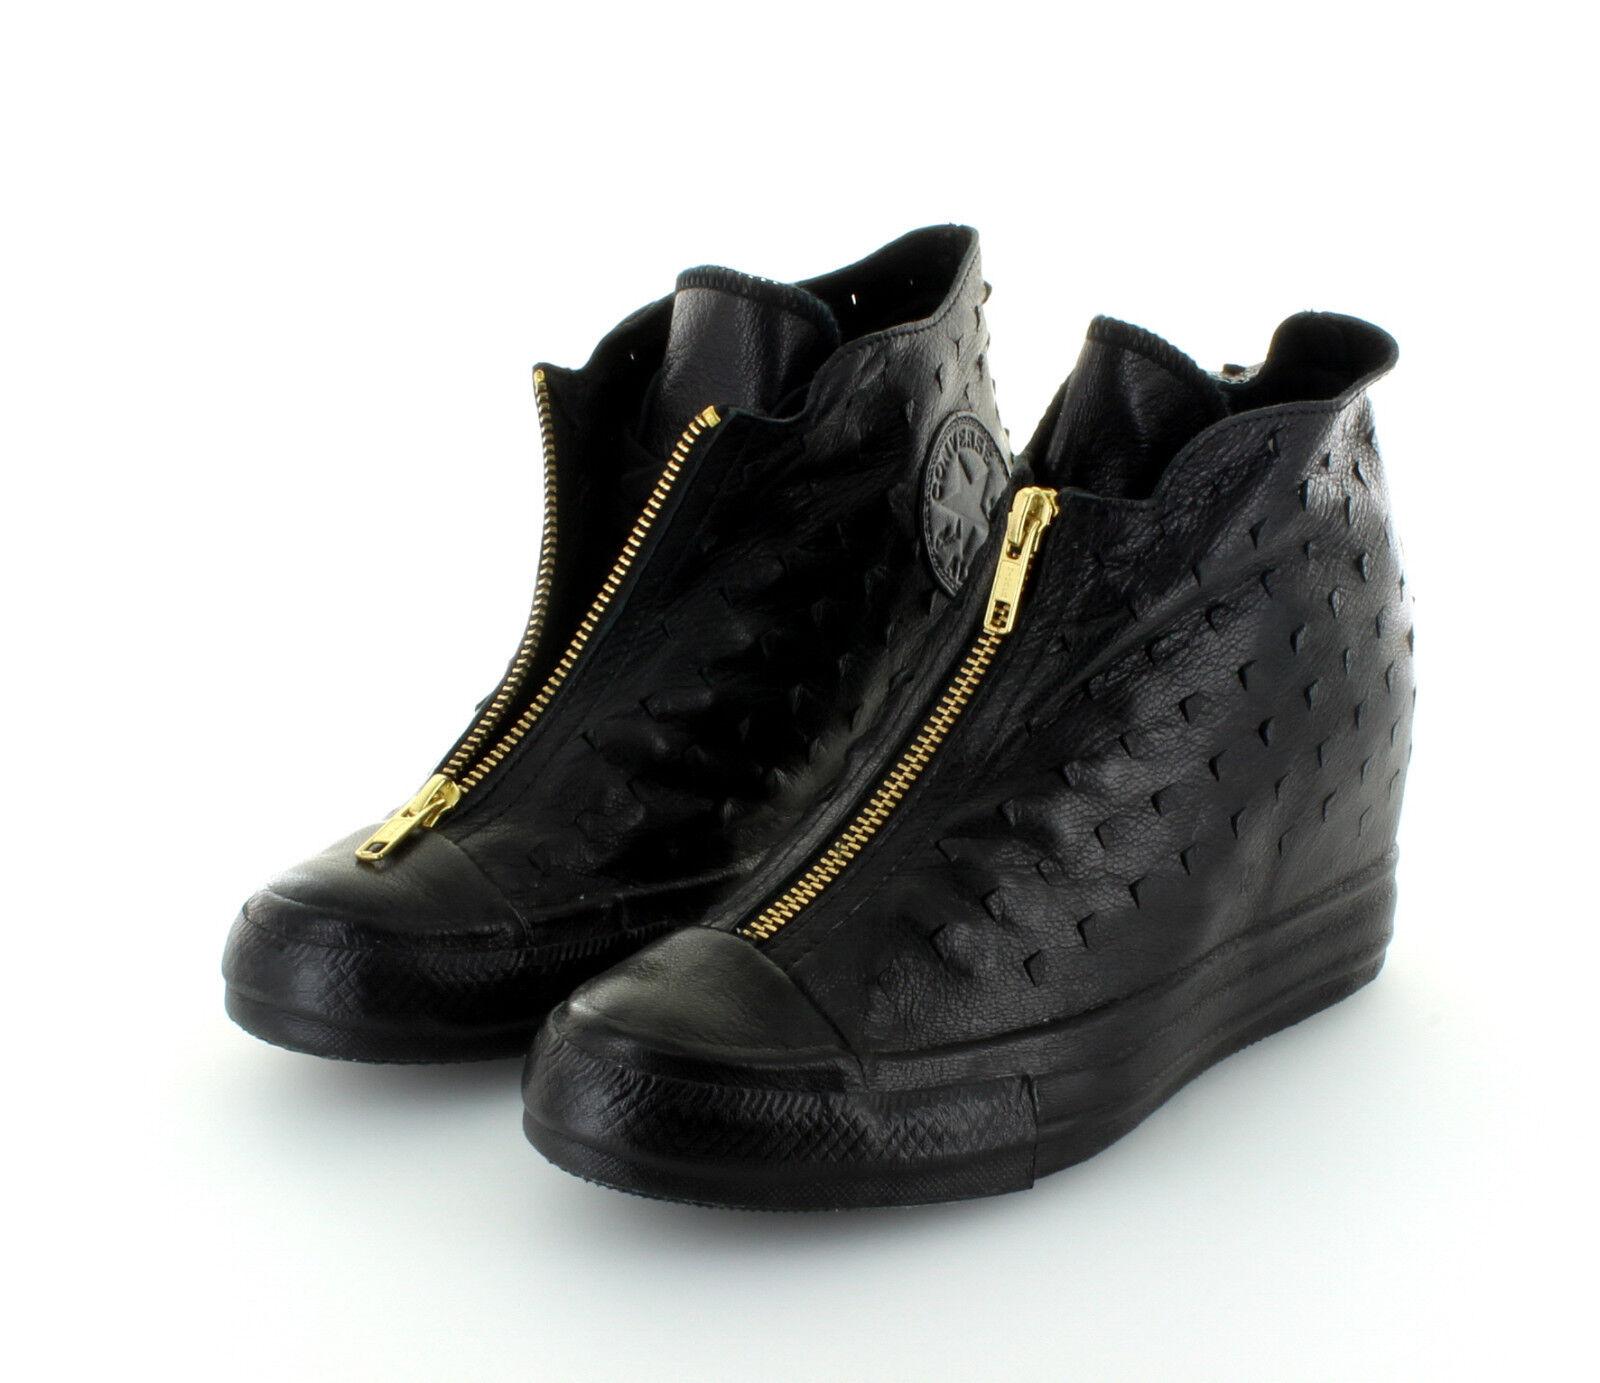 Converse CT BS Platform Hi Lux Shroud black Limited Edition Gr. 37,5 / 38,5